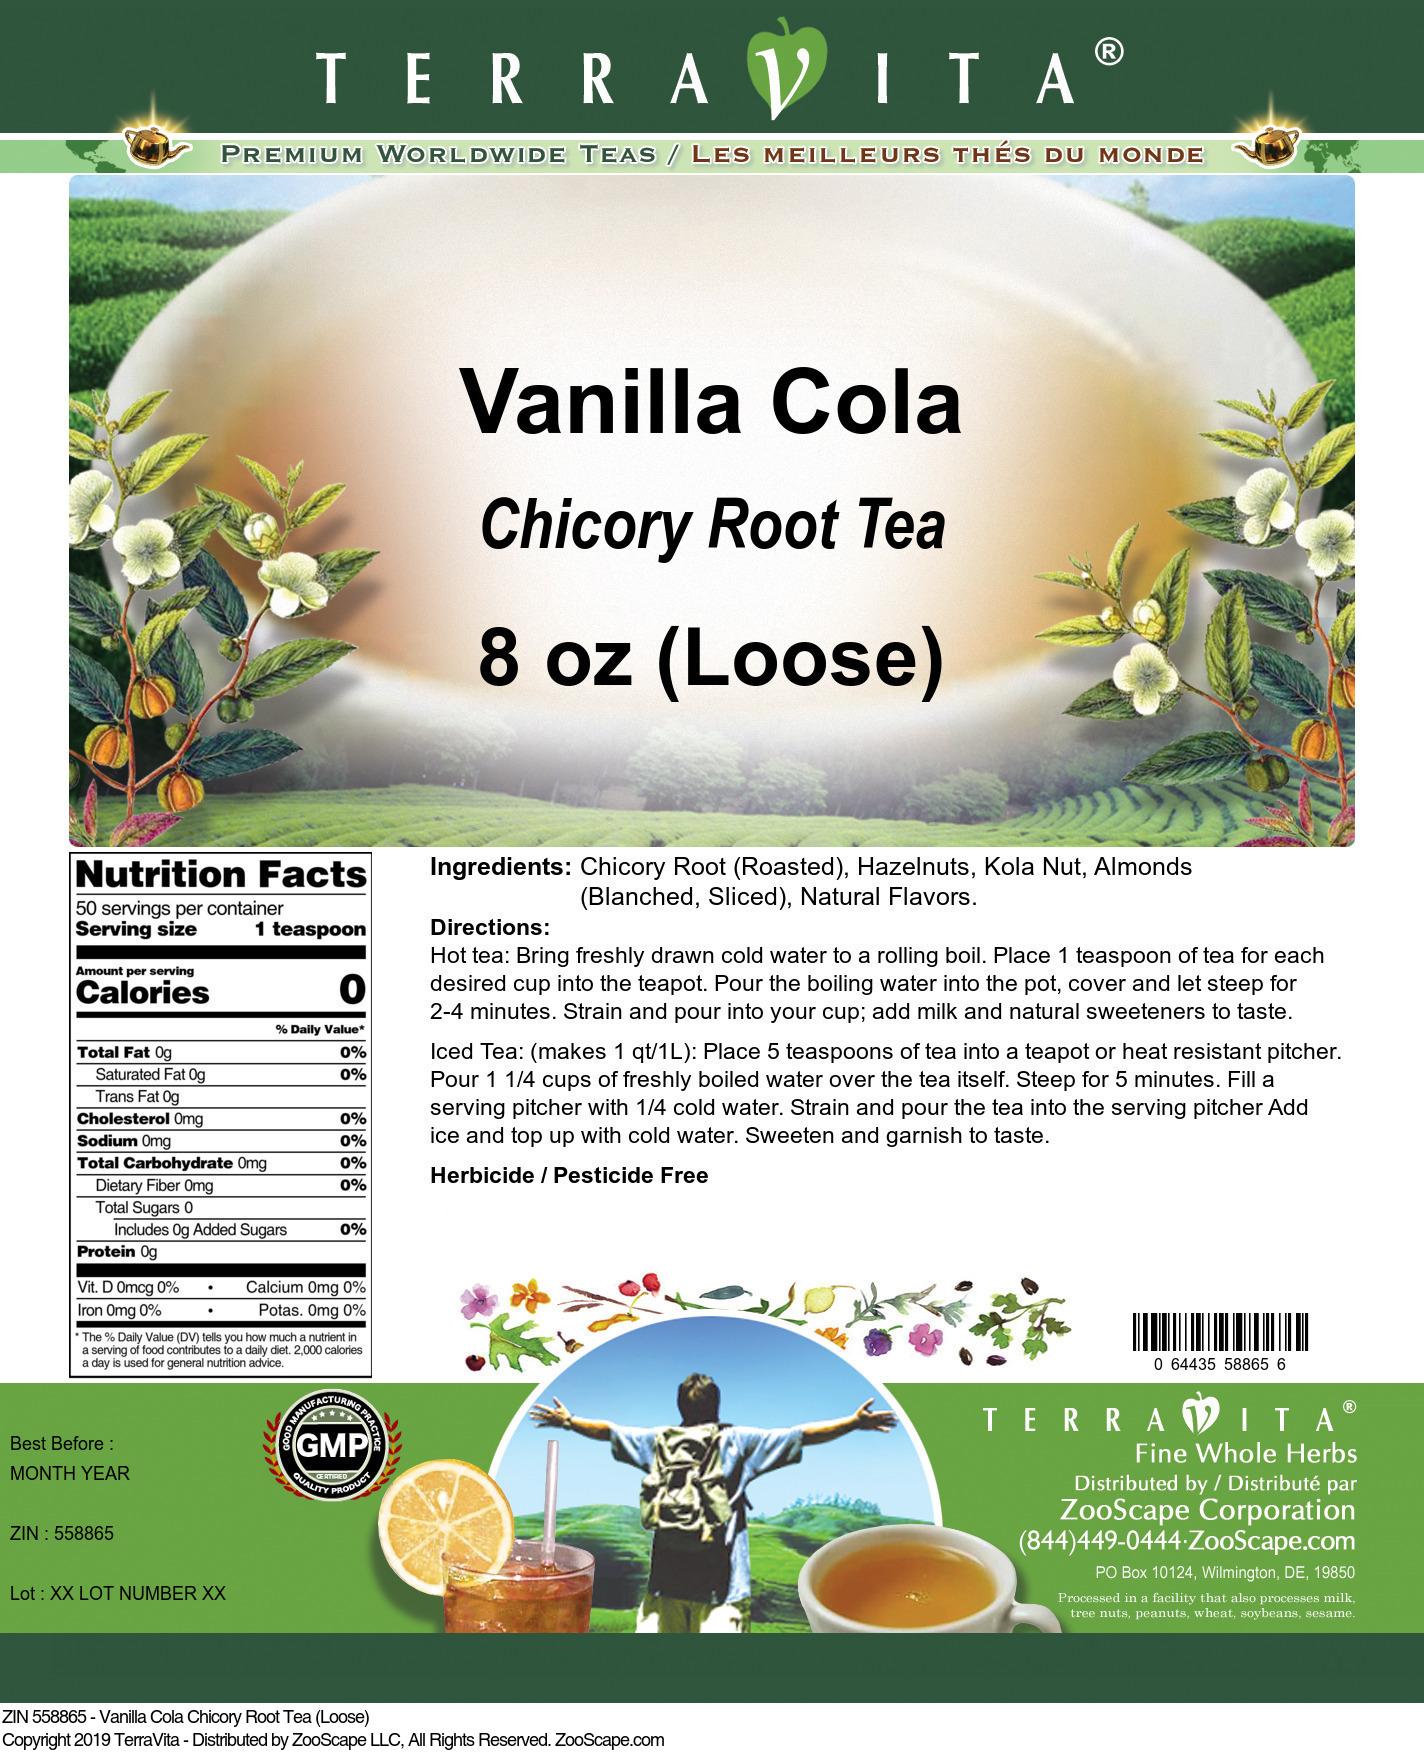 Vanilla Cola Chicory Root Tea (Loose)